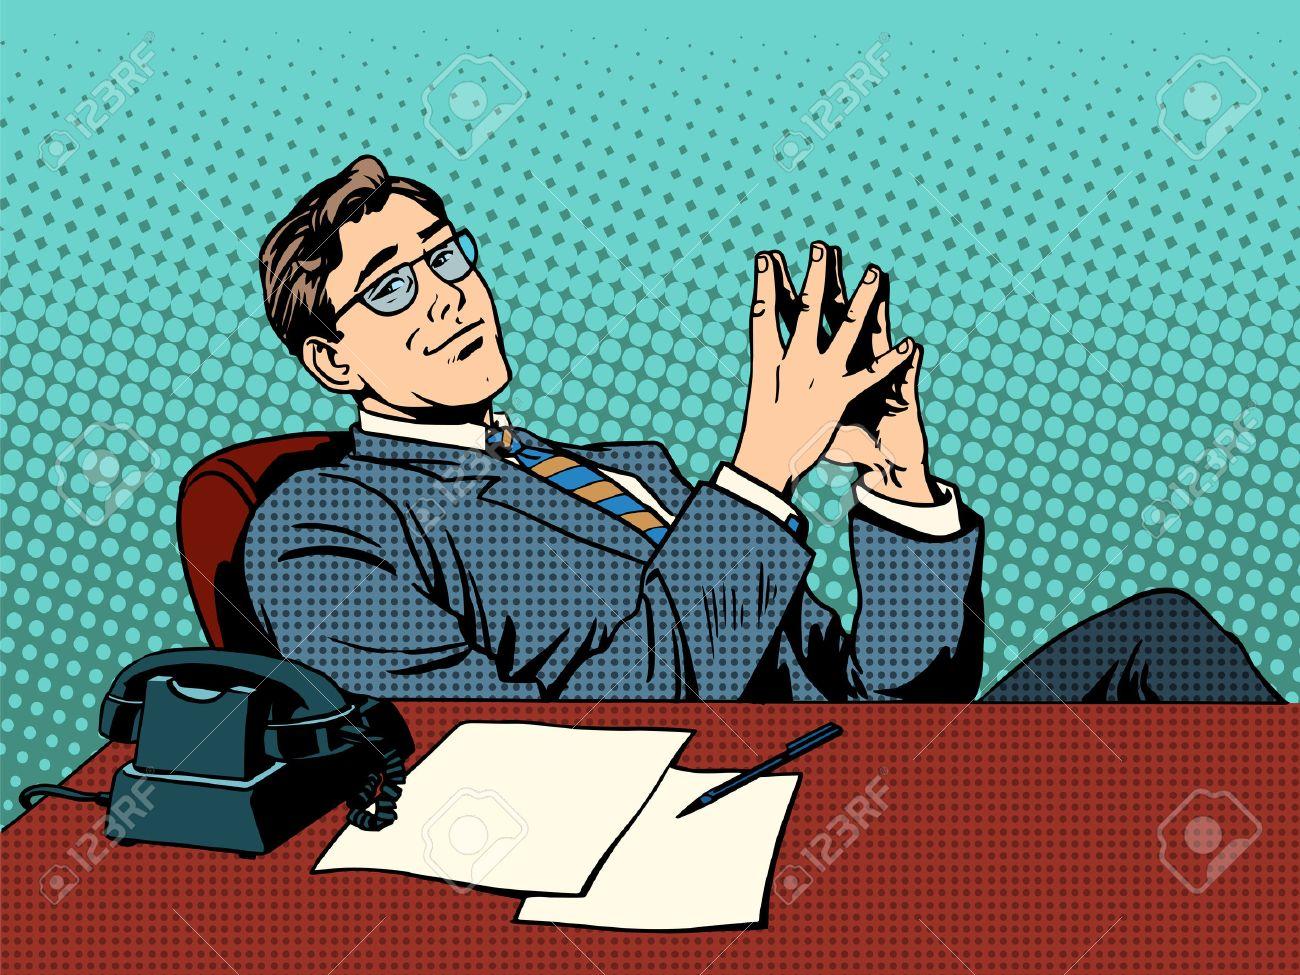 Ironic businessman boss. Business concept professional at work retro style pop art - 45686172